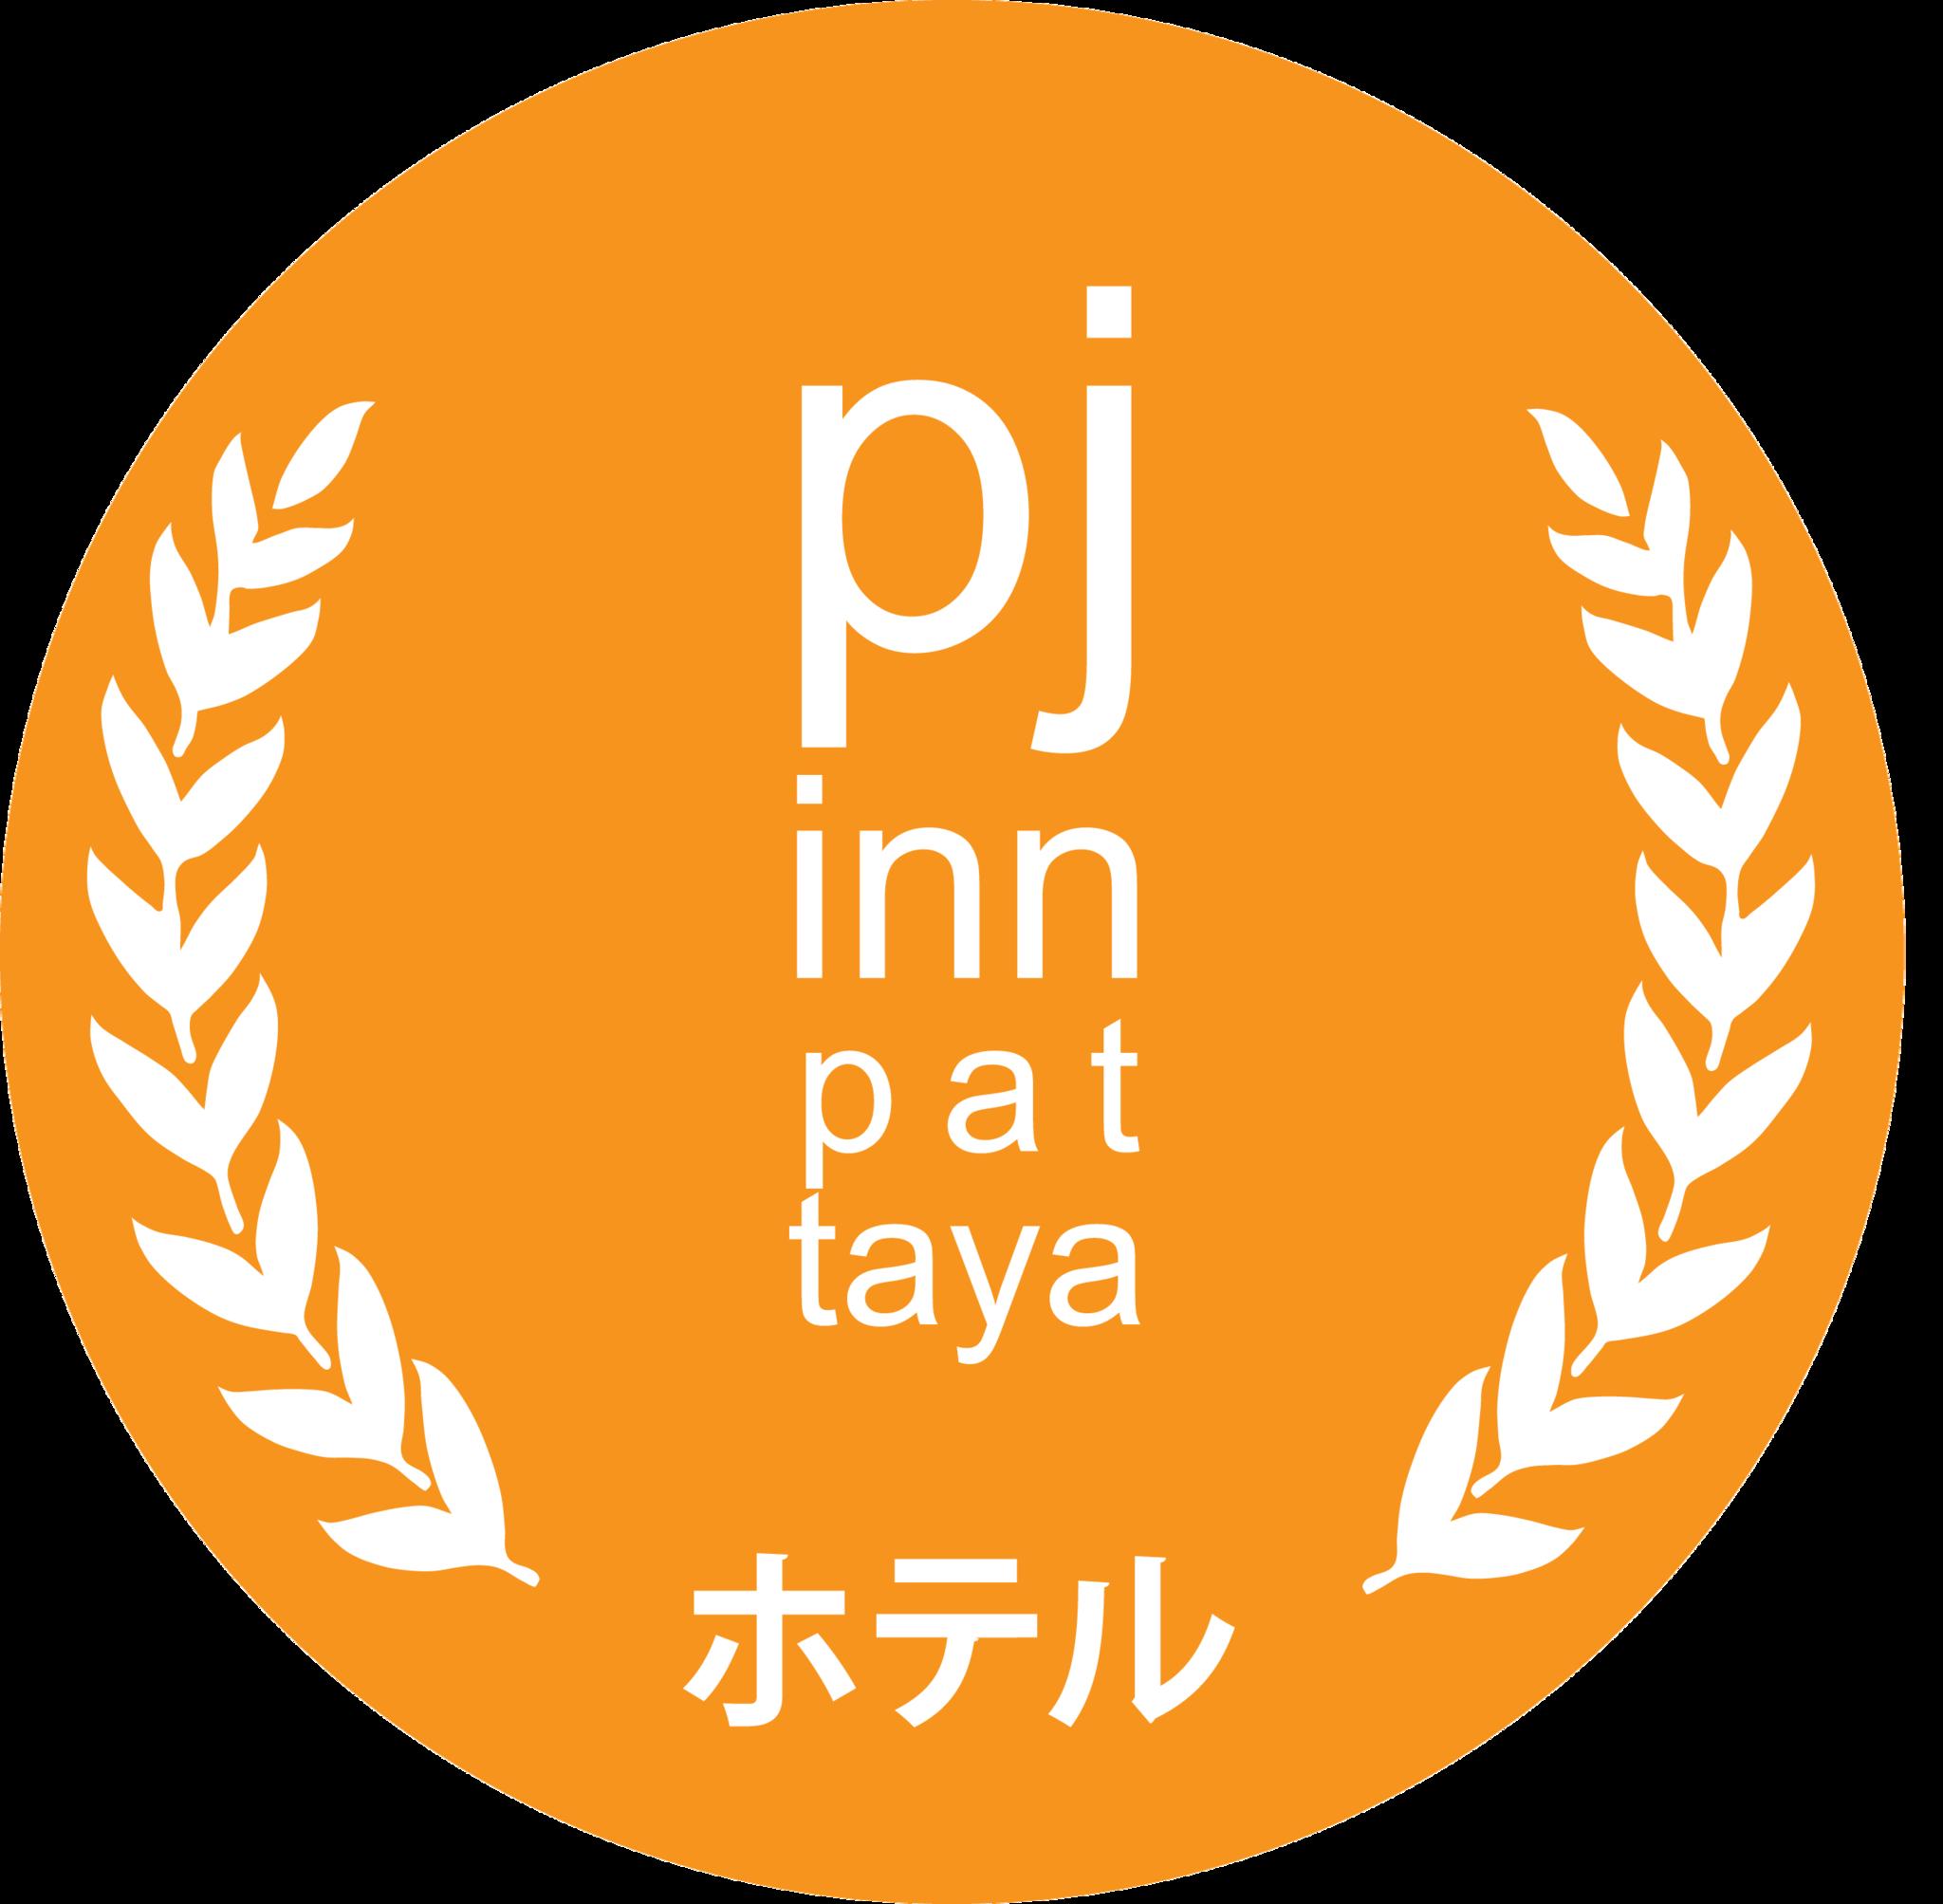 PJ Inn Pattaya